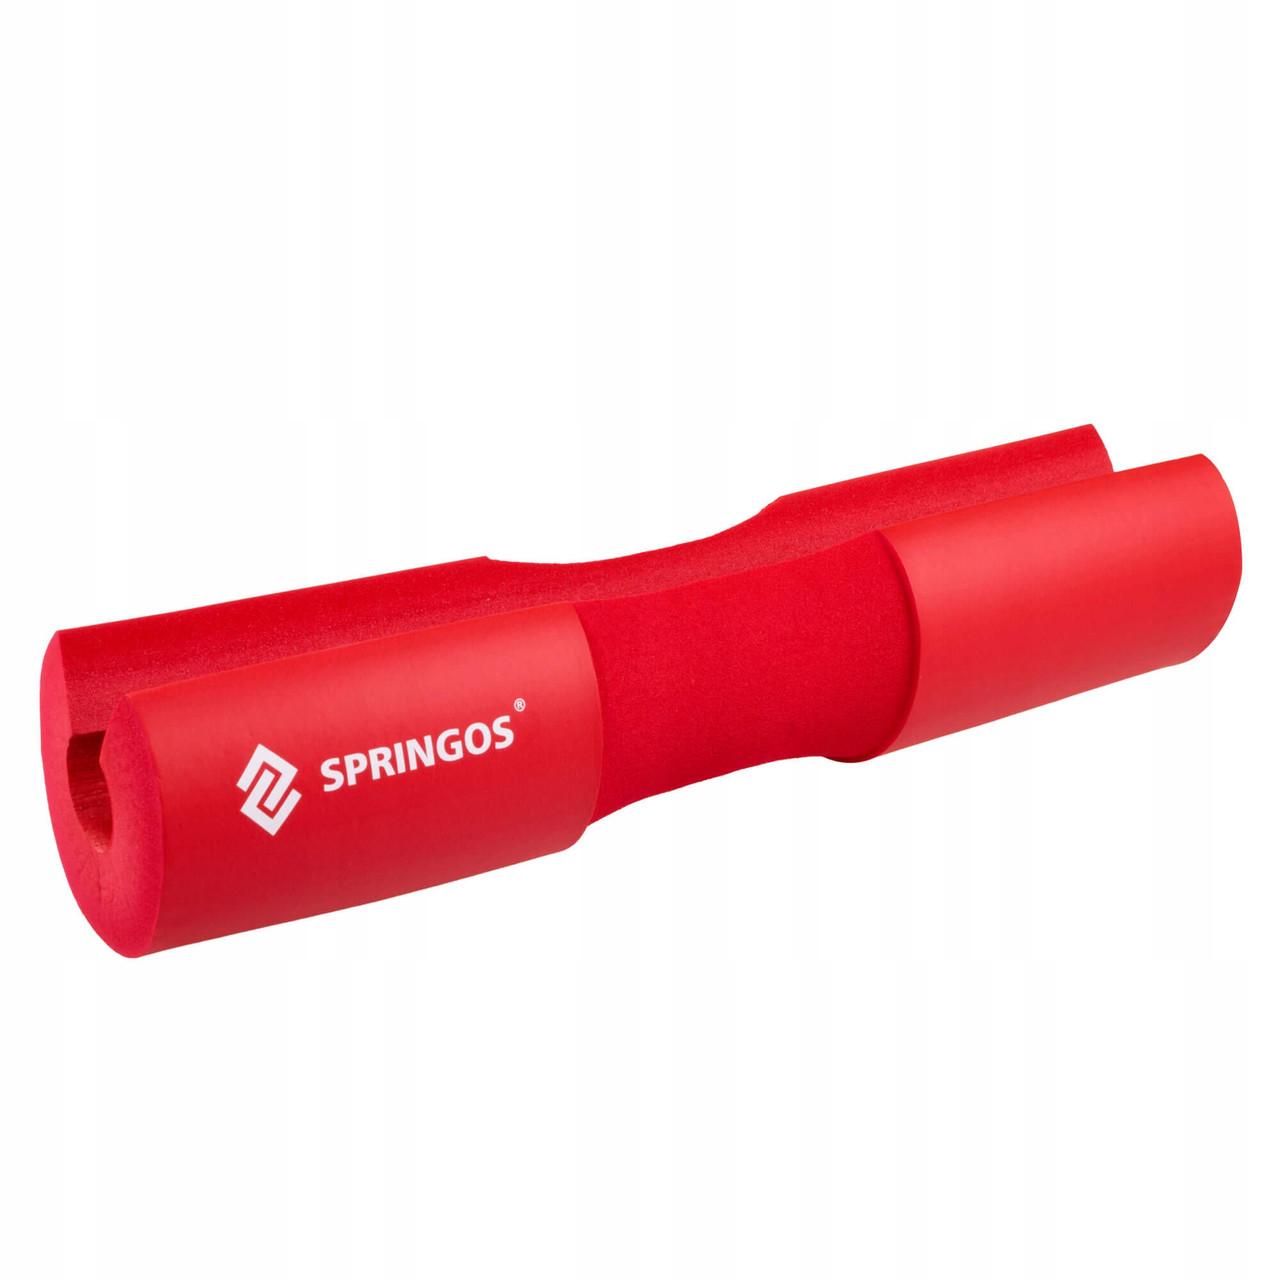 Накладка (бампер) на гриф Springos Barbell Pad FA0206 Red